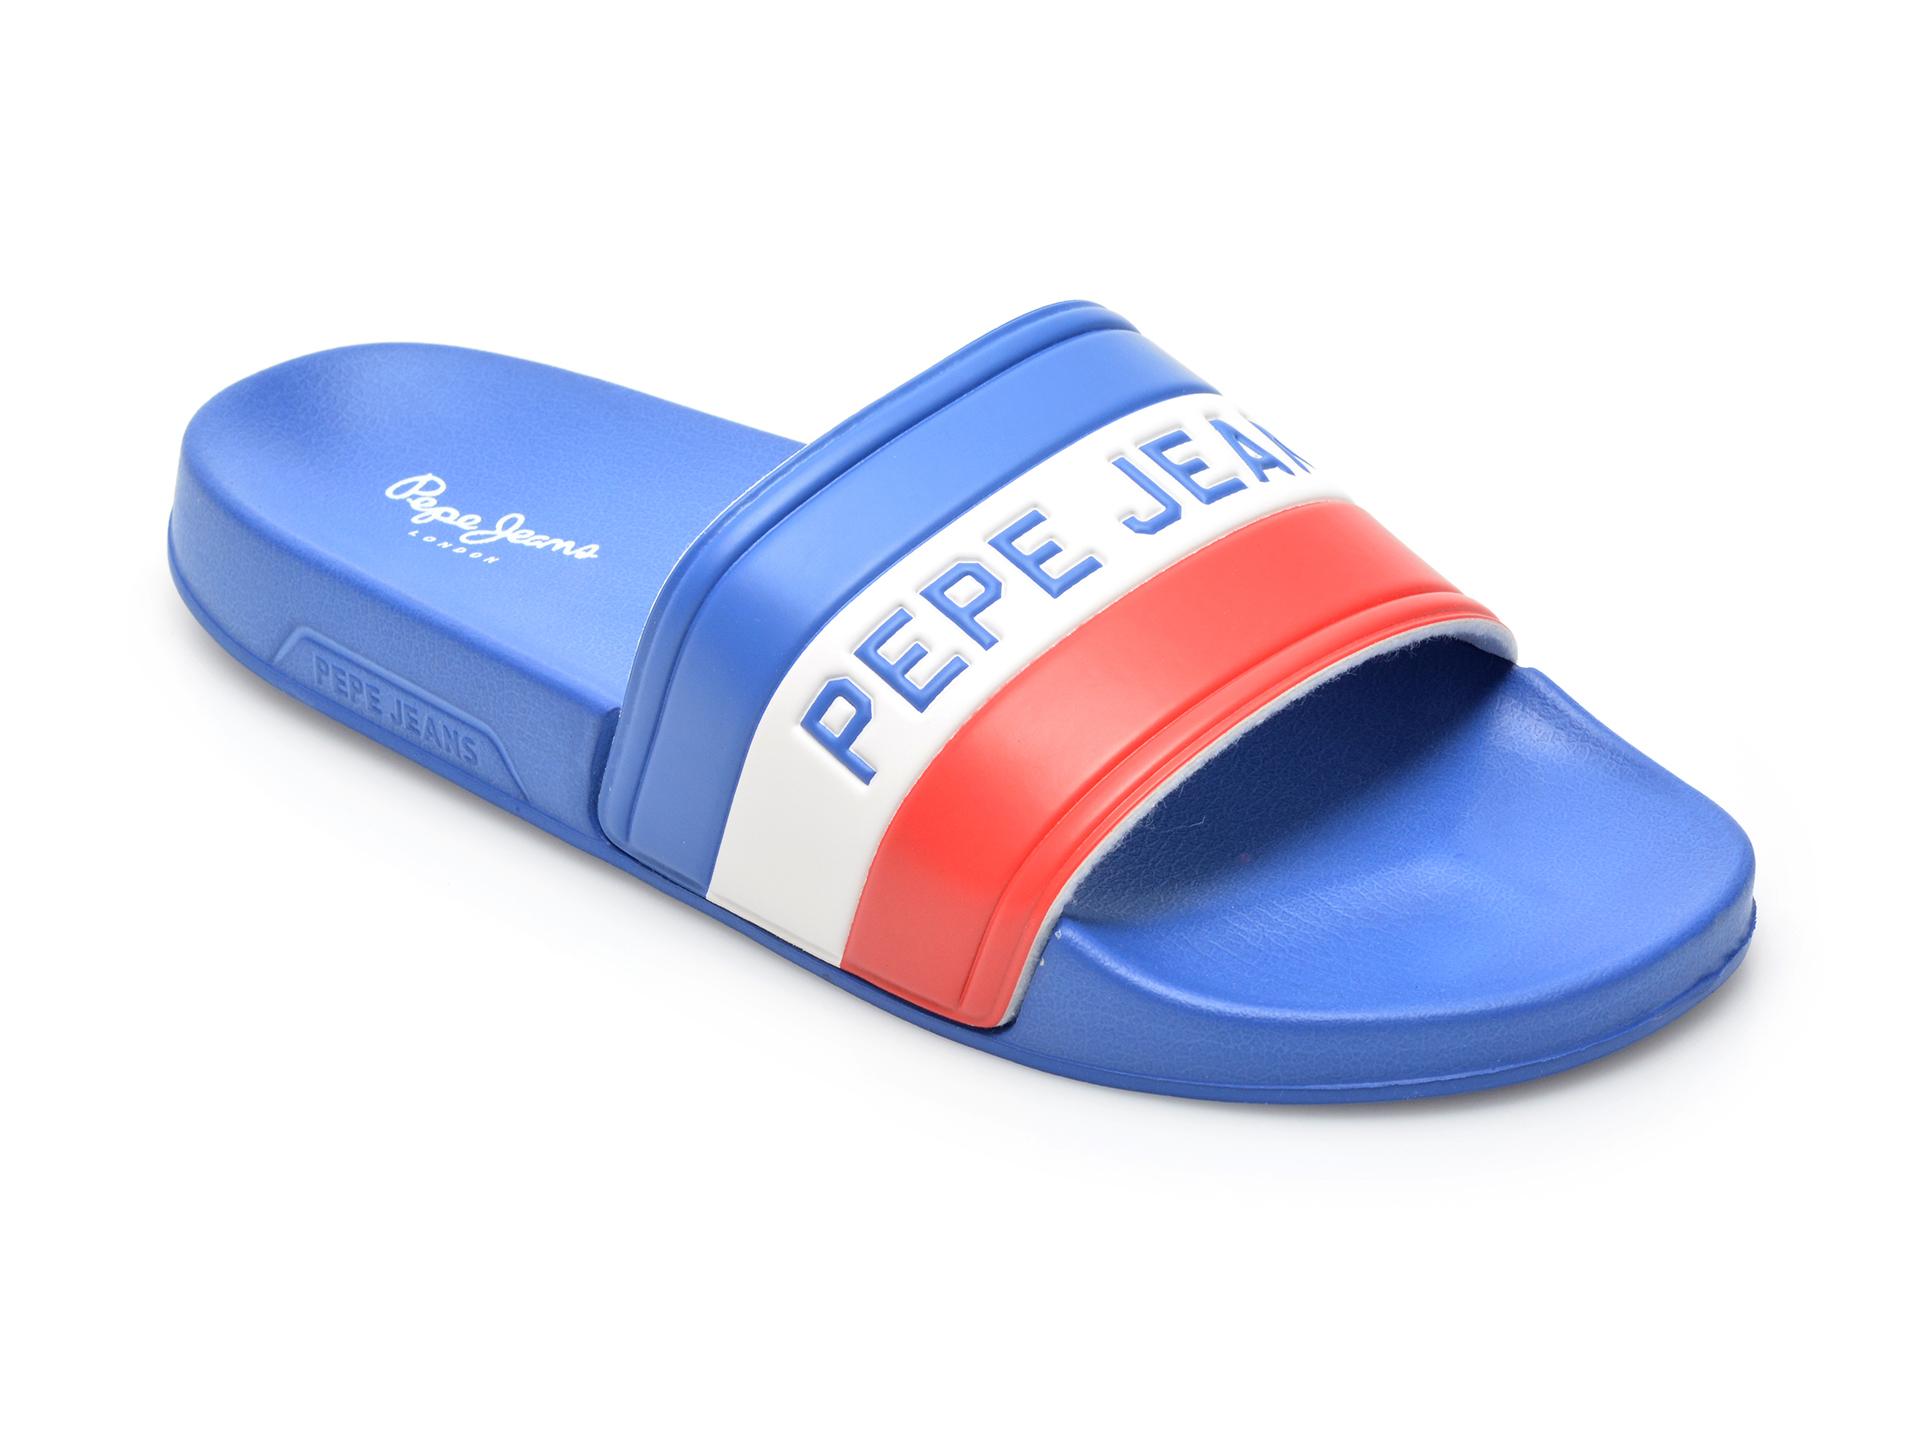 Papuci PEPE JEANS albastri, 7009599, din pvc